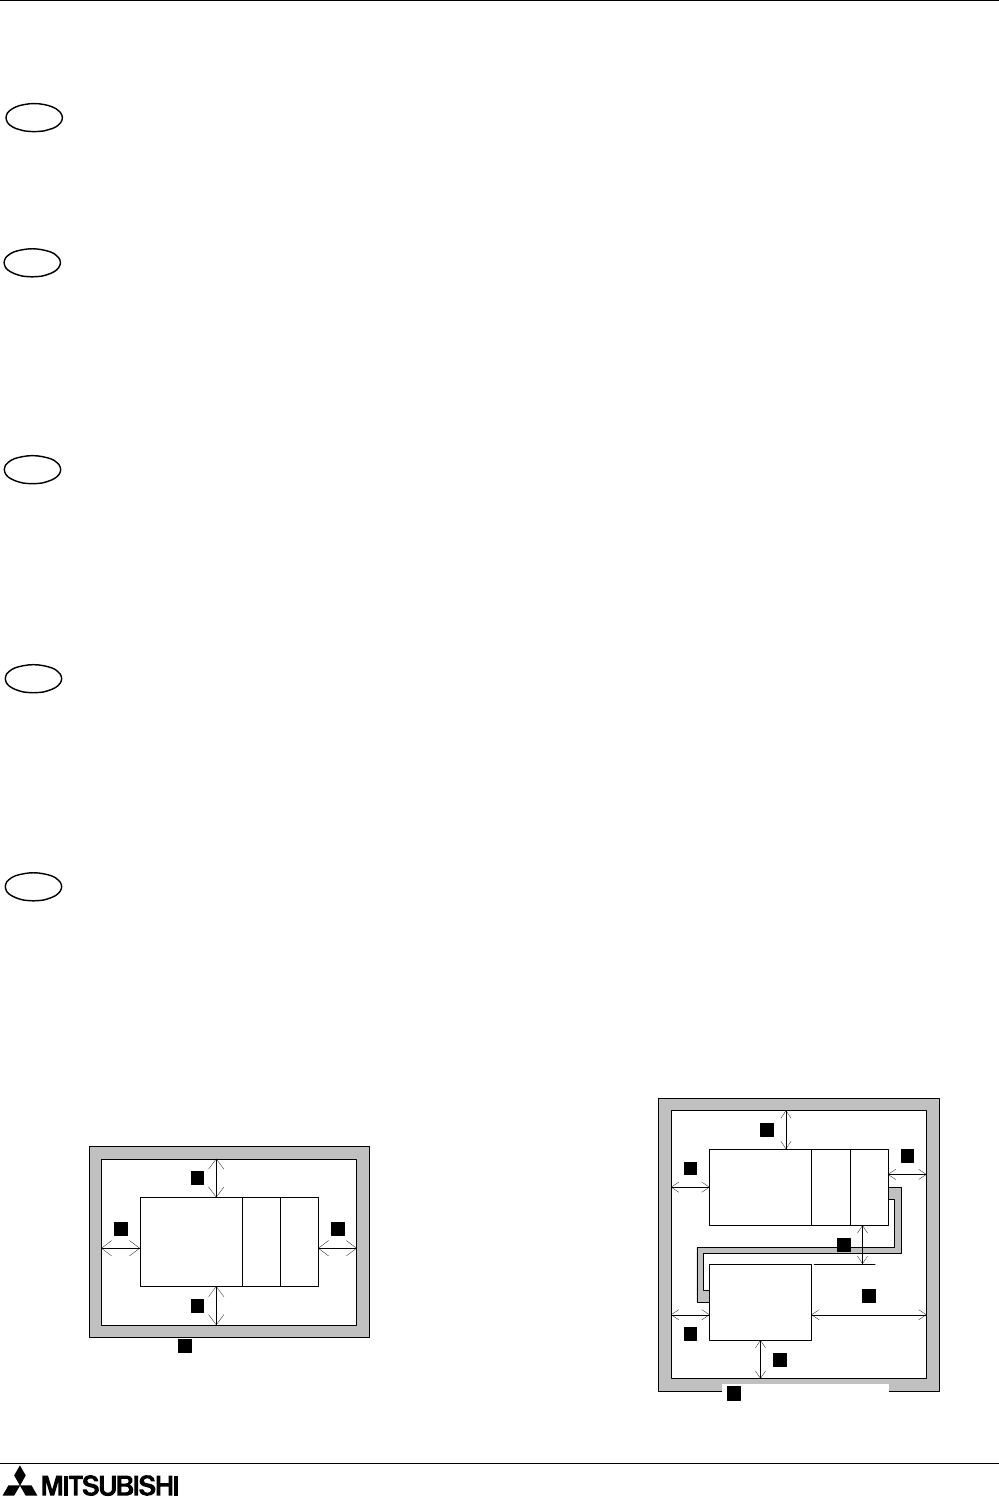 Mitsubishi Electronics Melsec Fx2N Users Manual Hardware